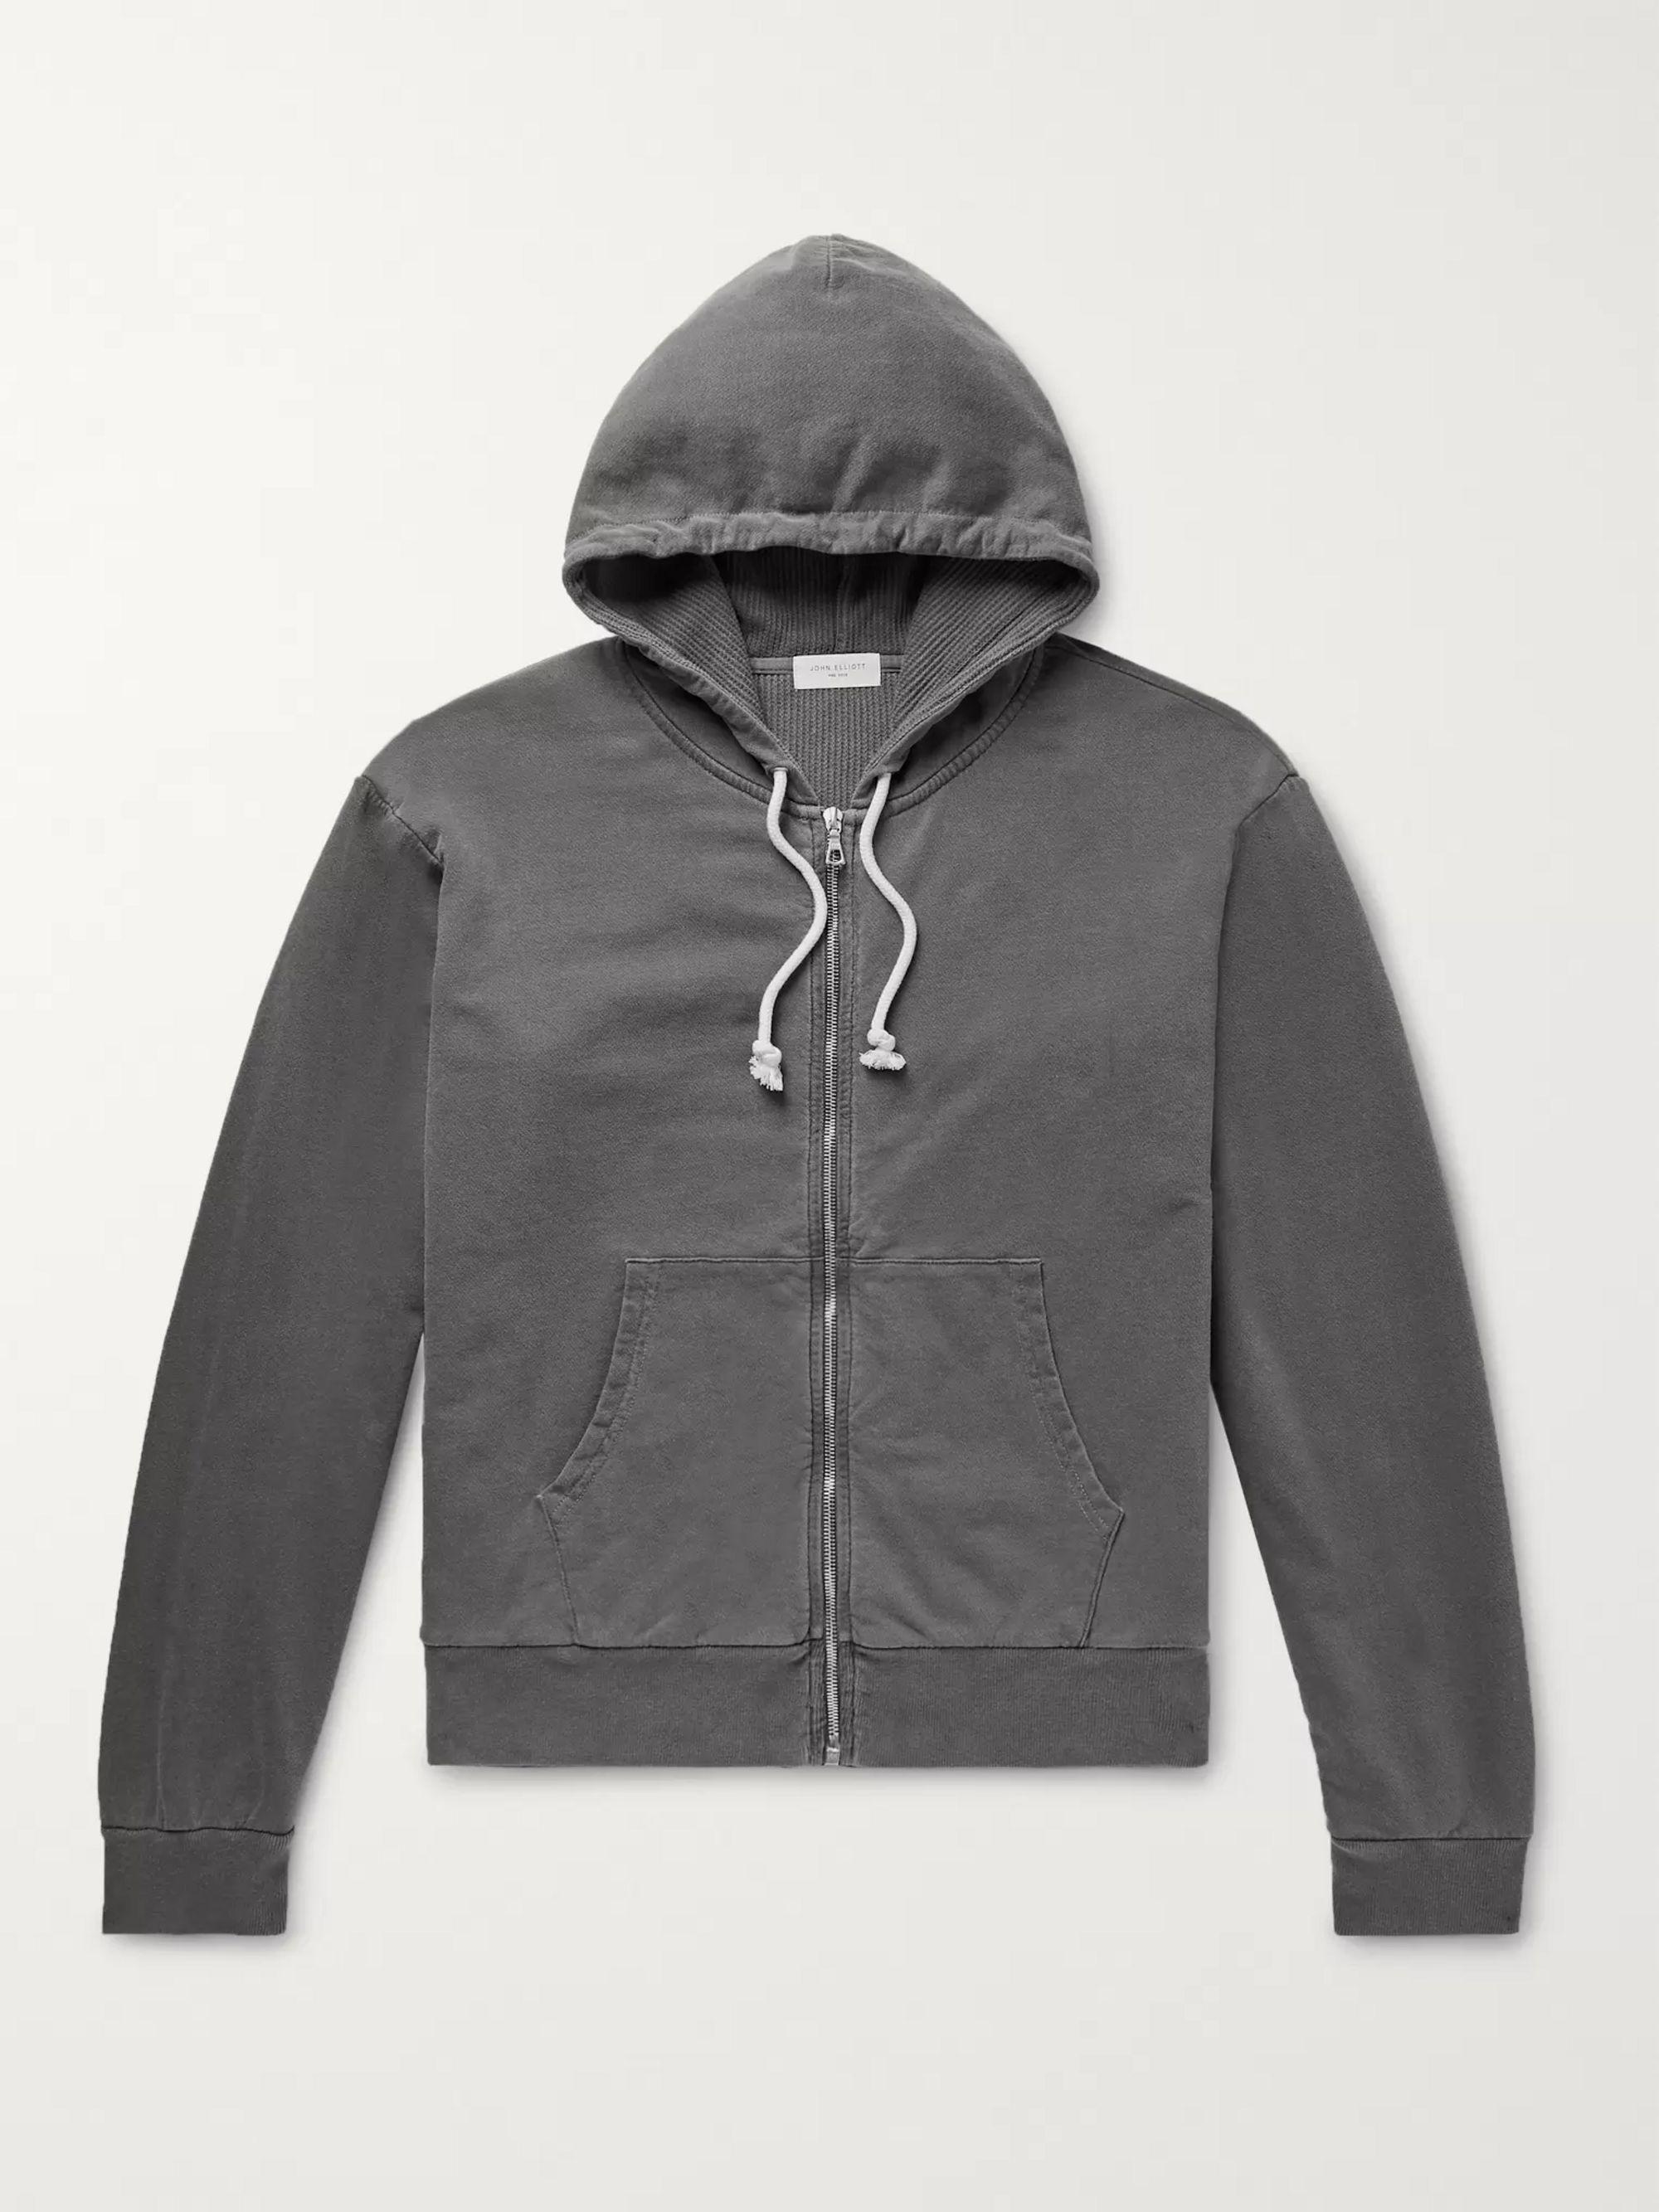 Acne Studios fade effect hoodie grey Cotton | MODES